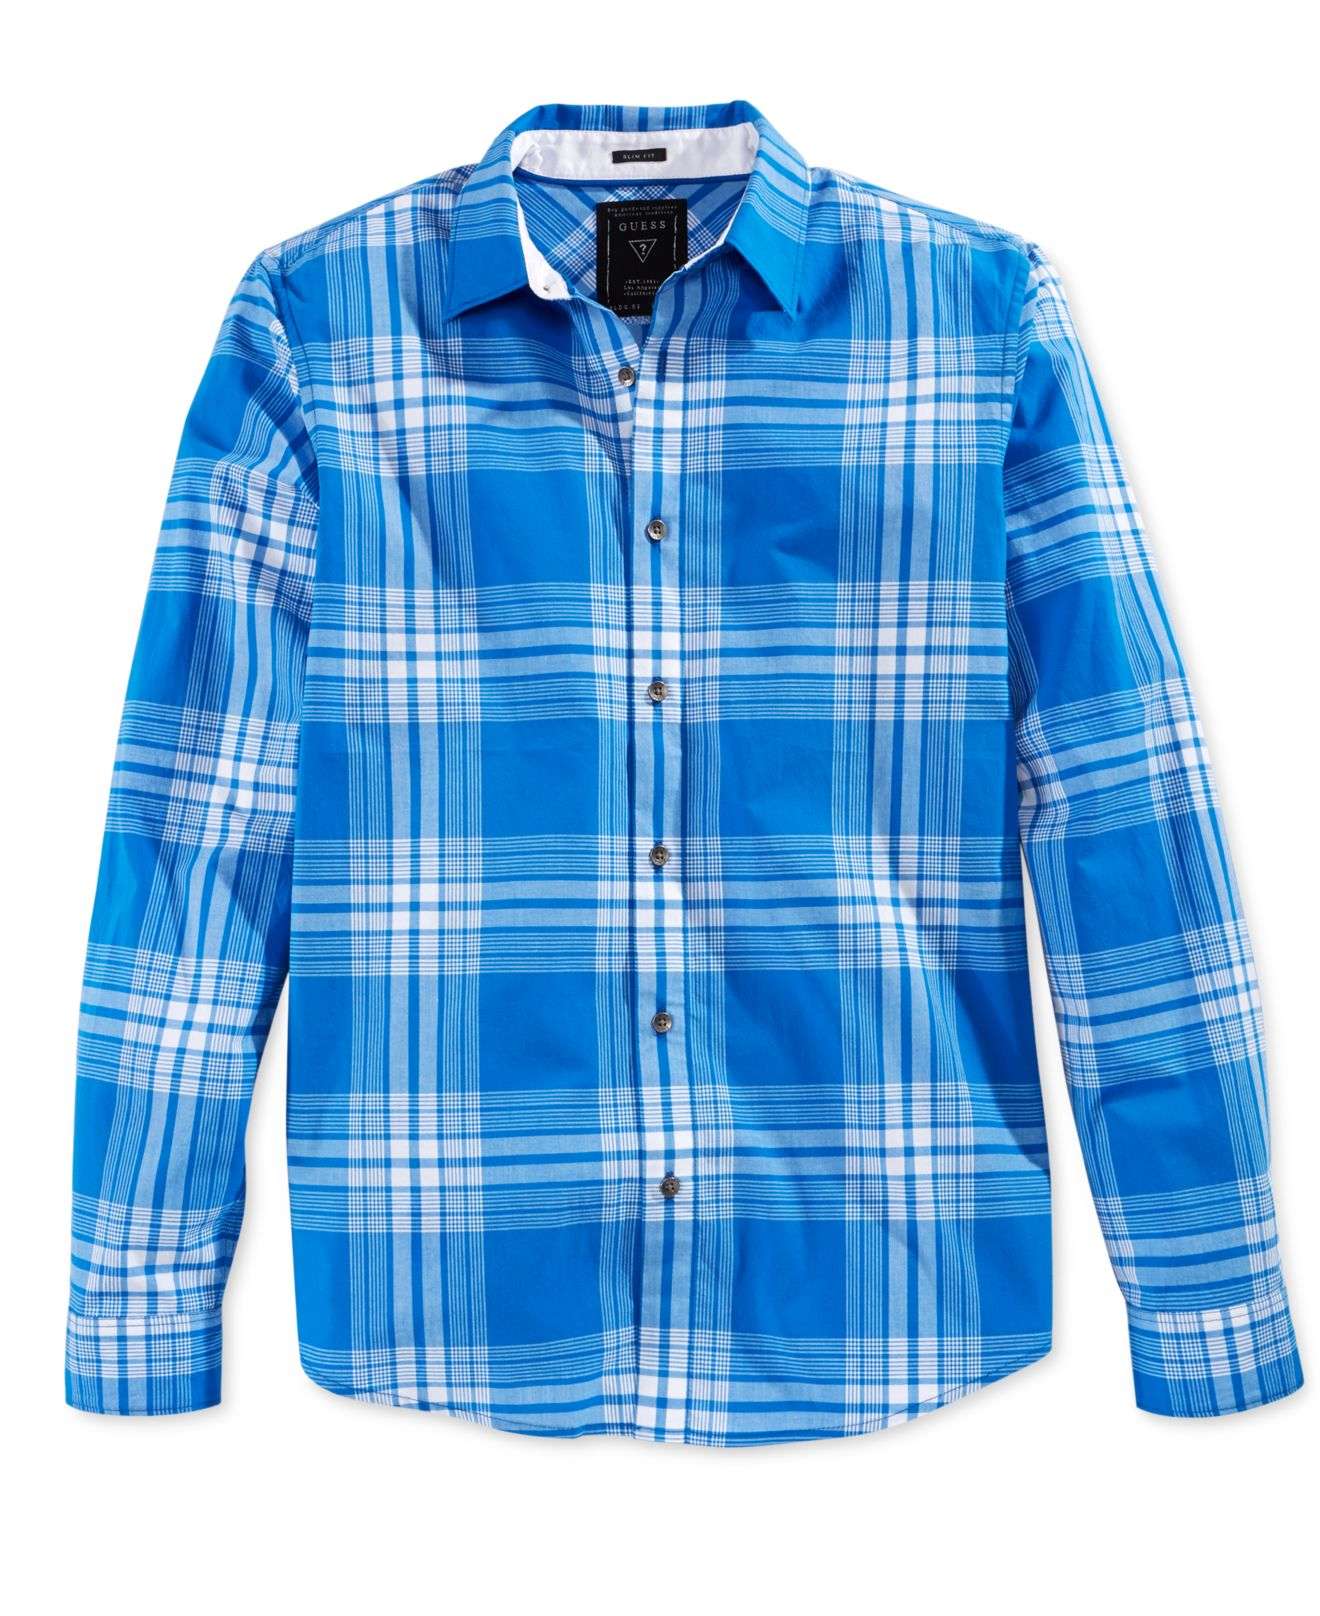 Calvin klein mens cotton long sleeve plaid casual shirt at for Mens casual plaid shirts